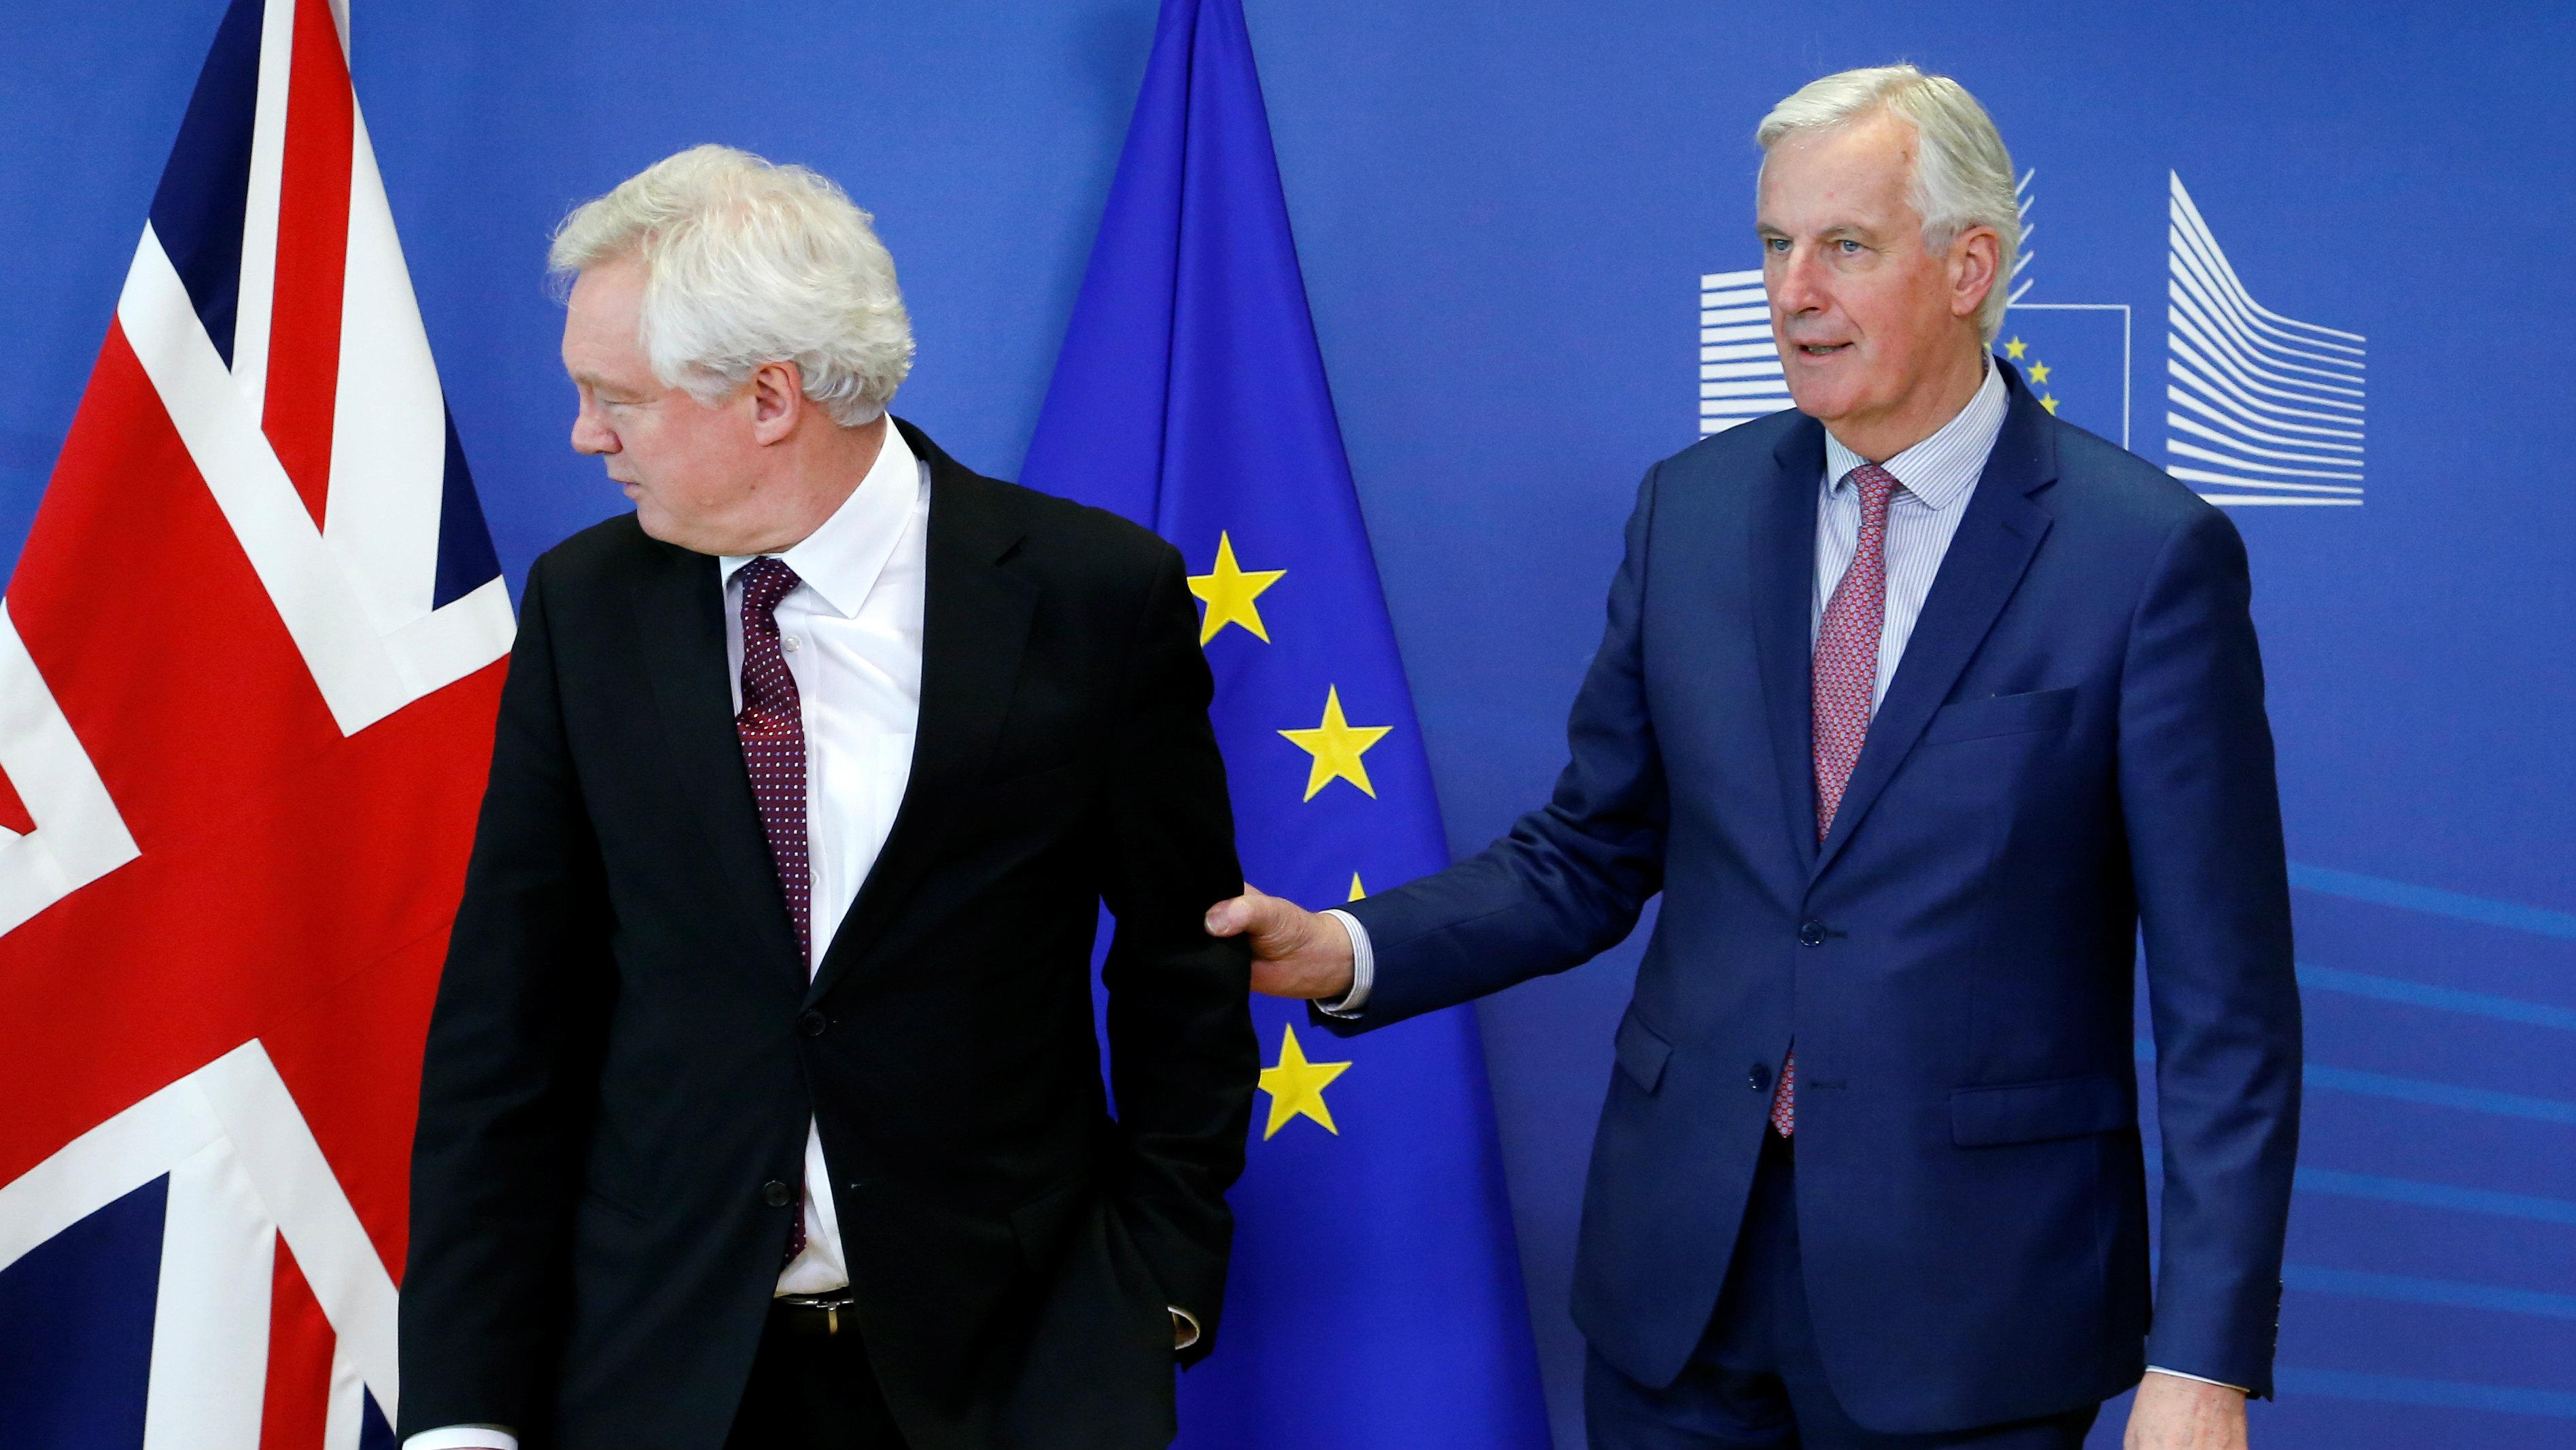 Britain's Secretary of State for Exiting the European Union David Davis and European Union's chief Brexit negotiator Michel Barnier